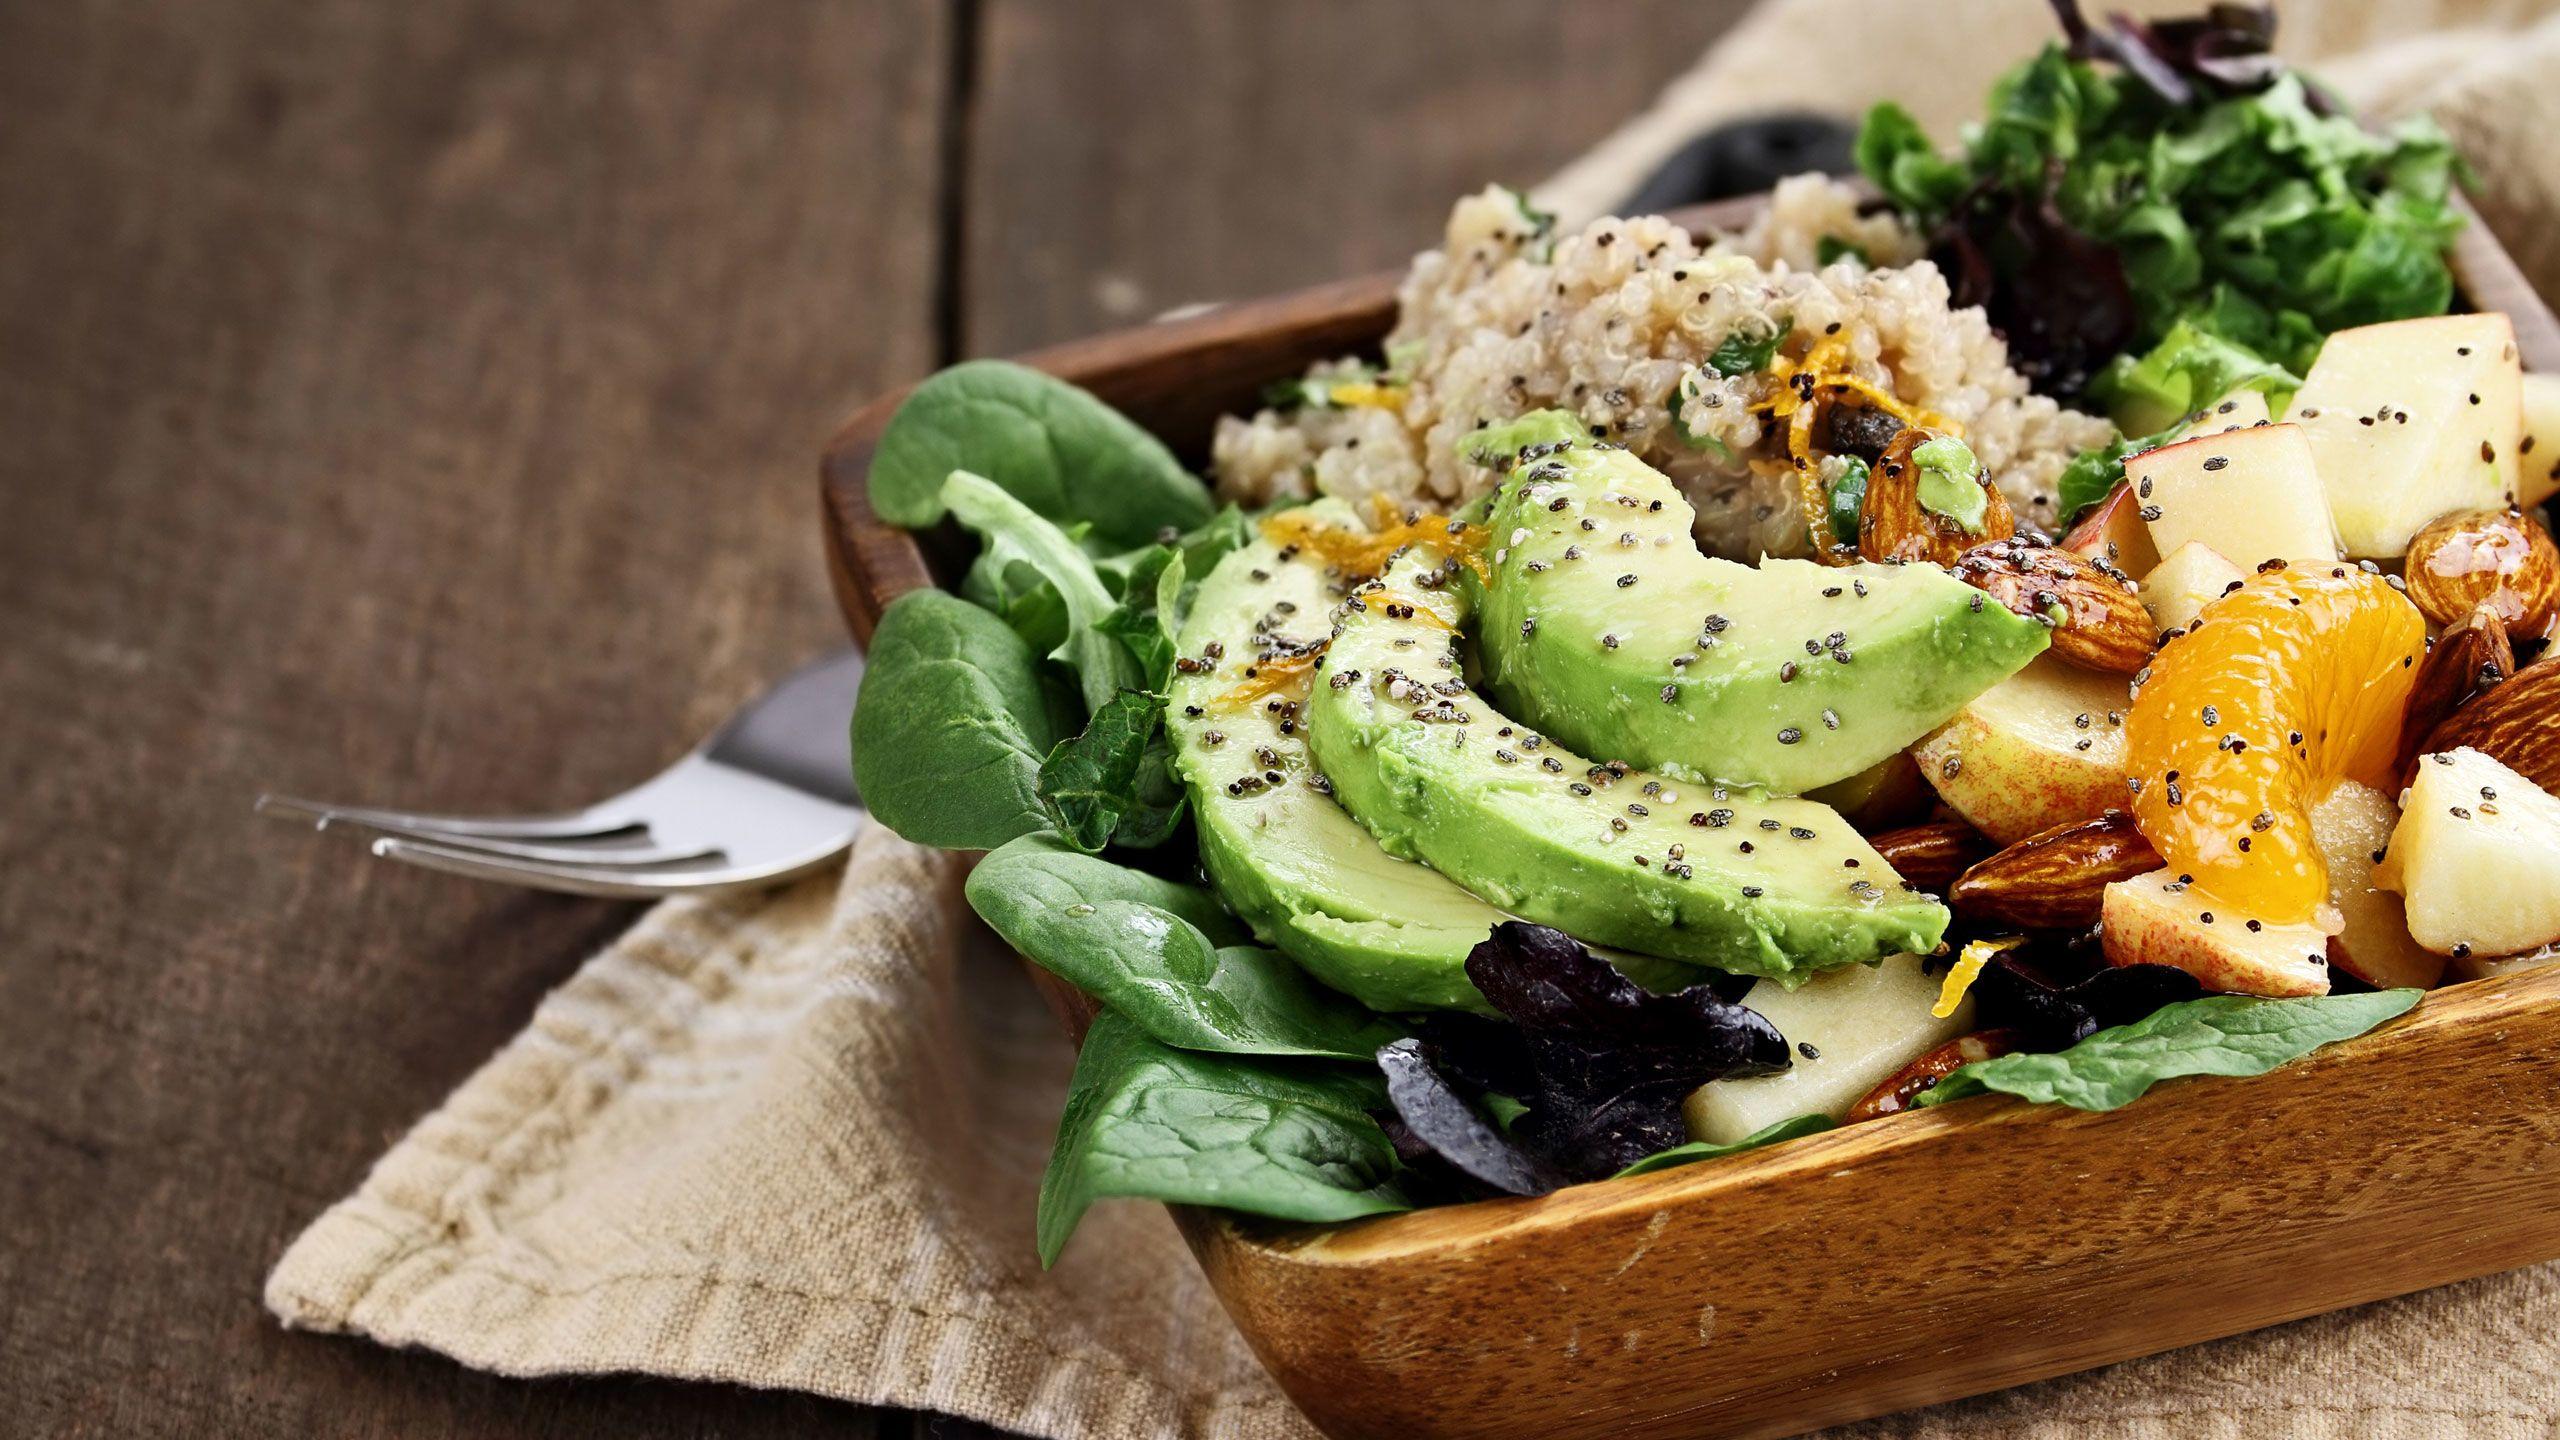 6 Lettuce-Free Salad Recipes